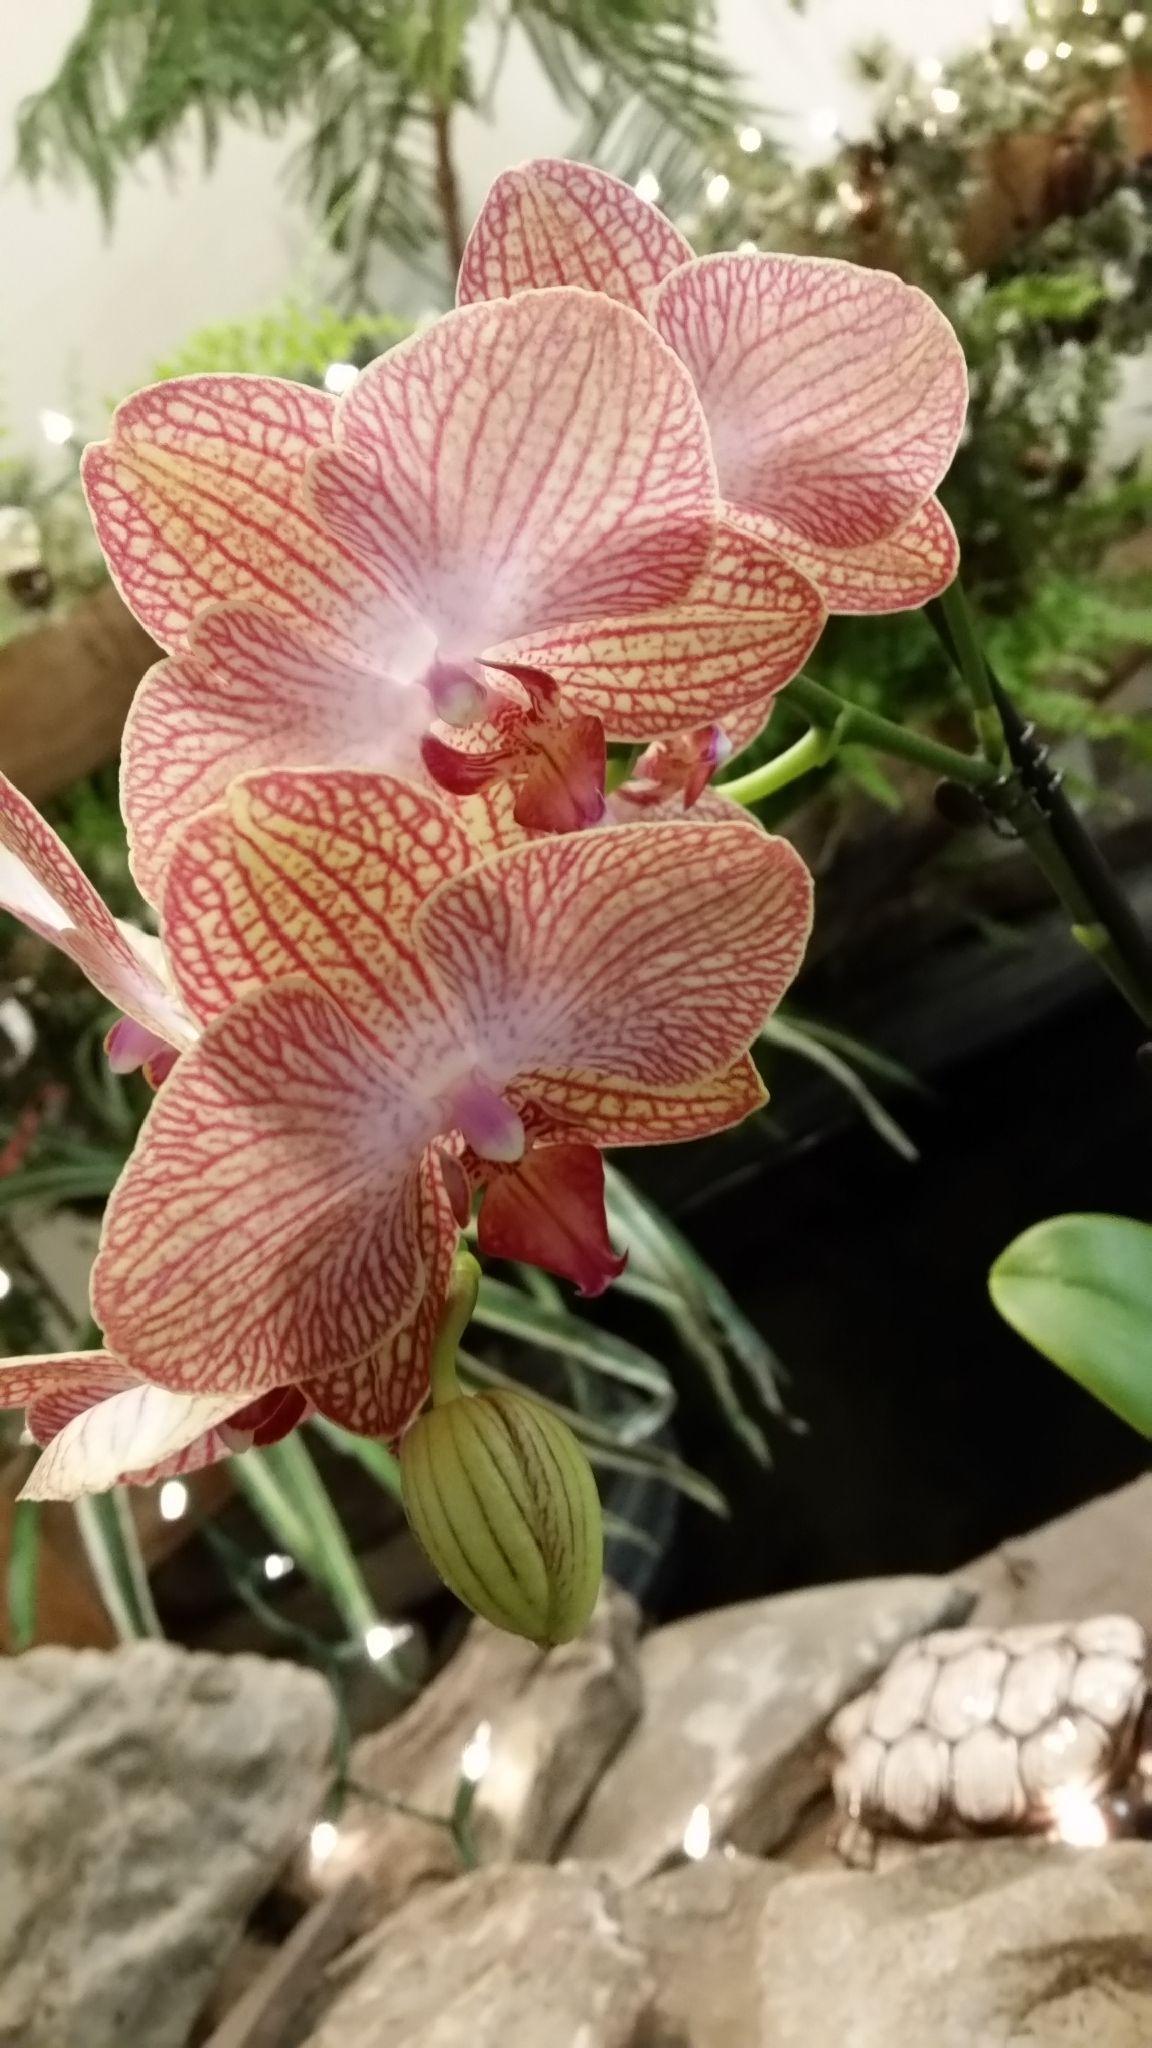 Peach orchids